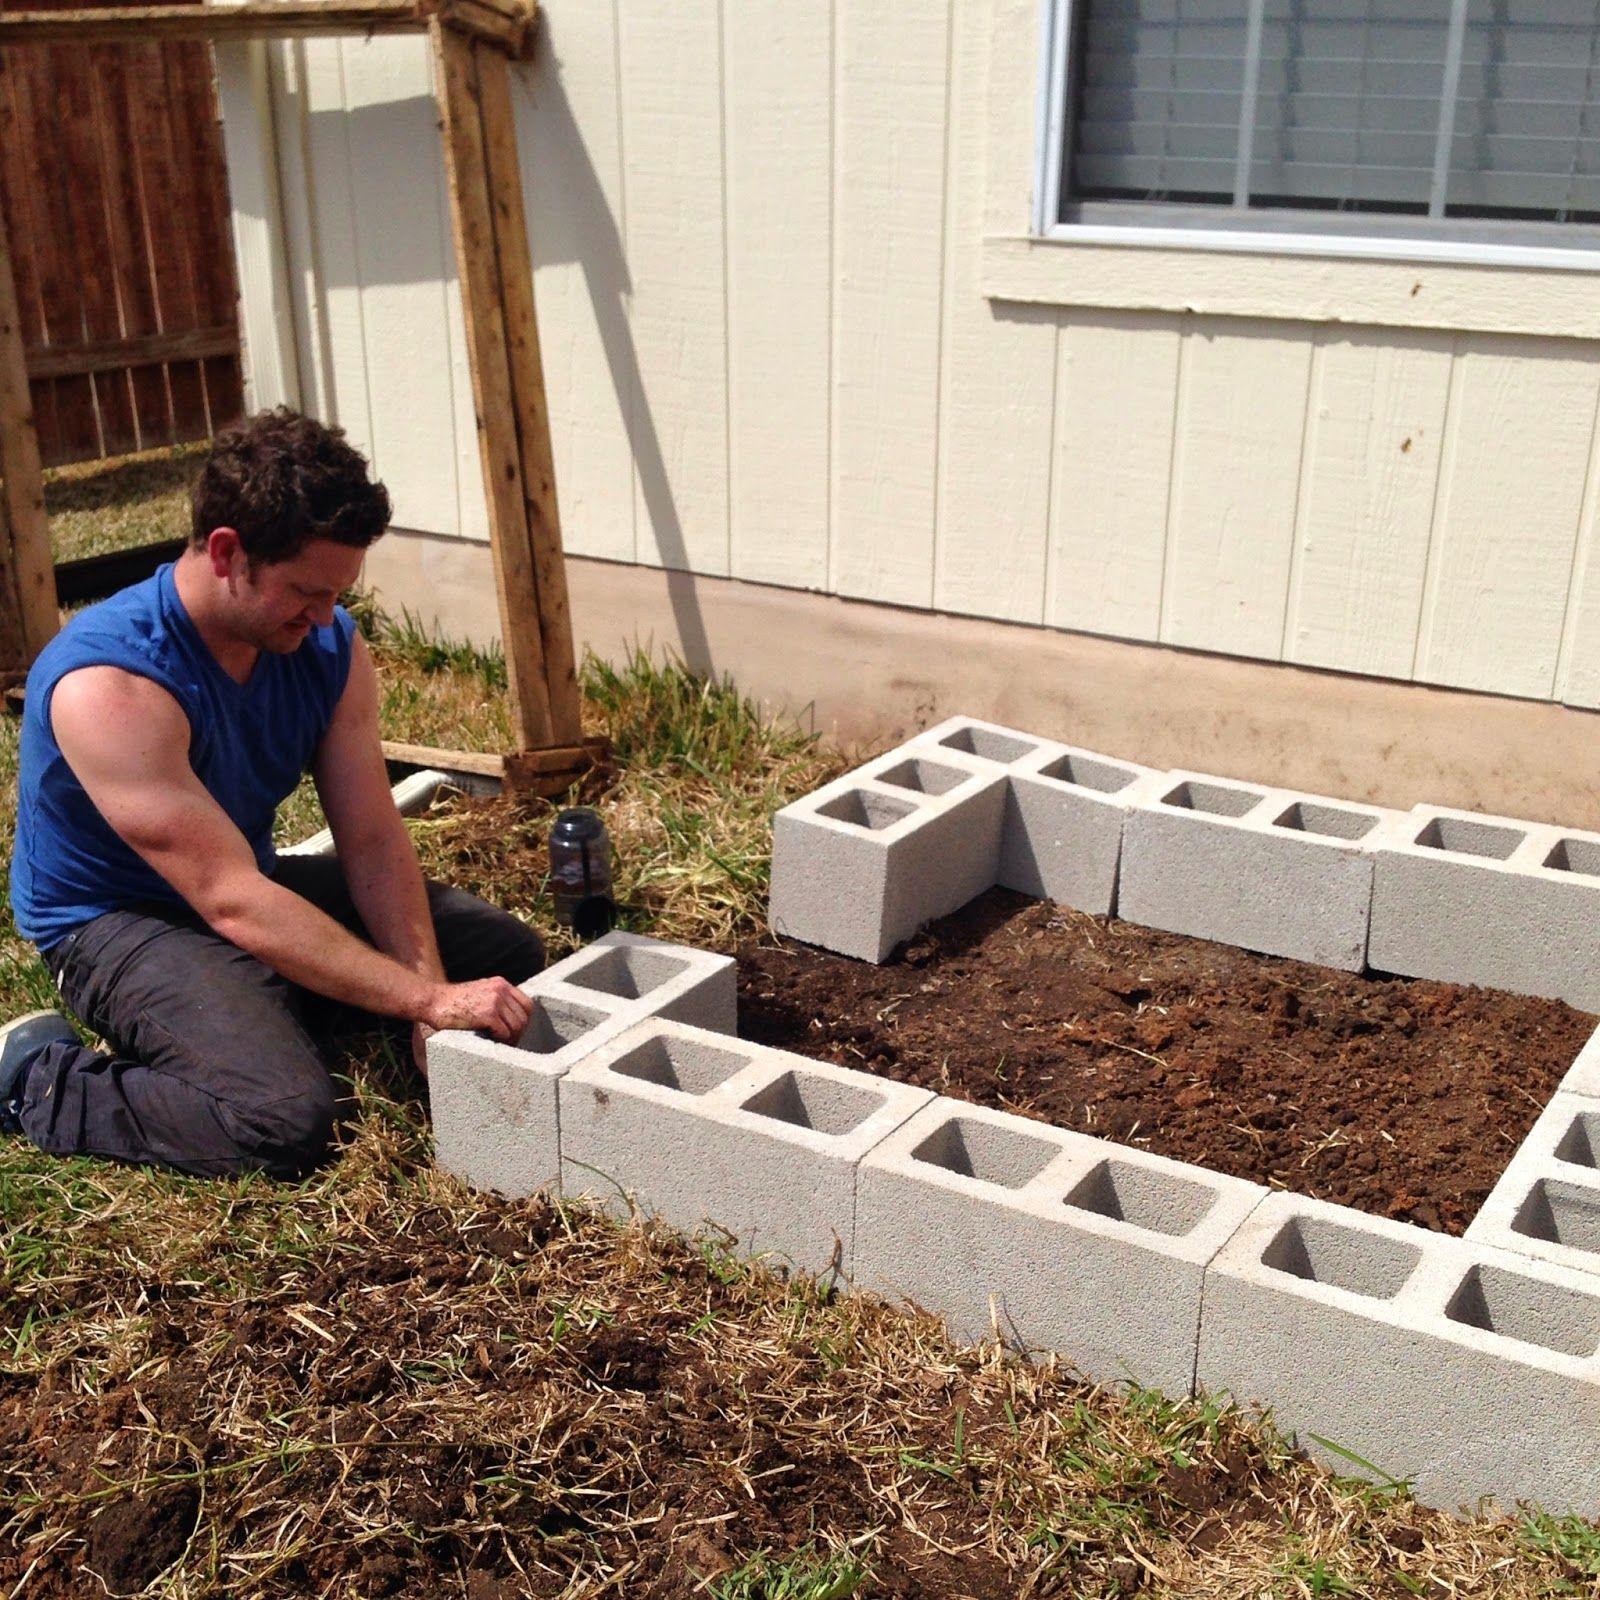 DIY Cinder Block Raised Garden Bed Raised garden beds